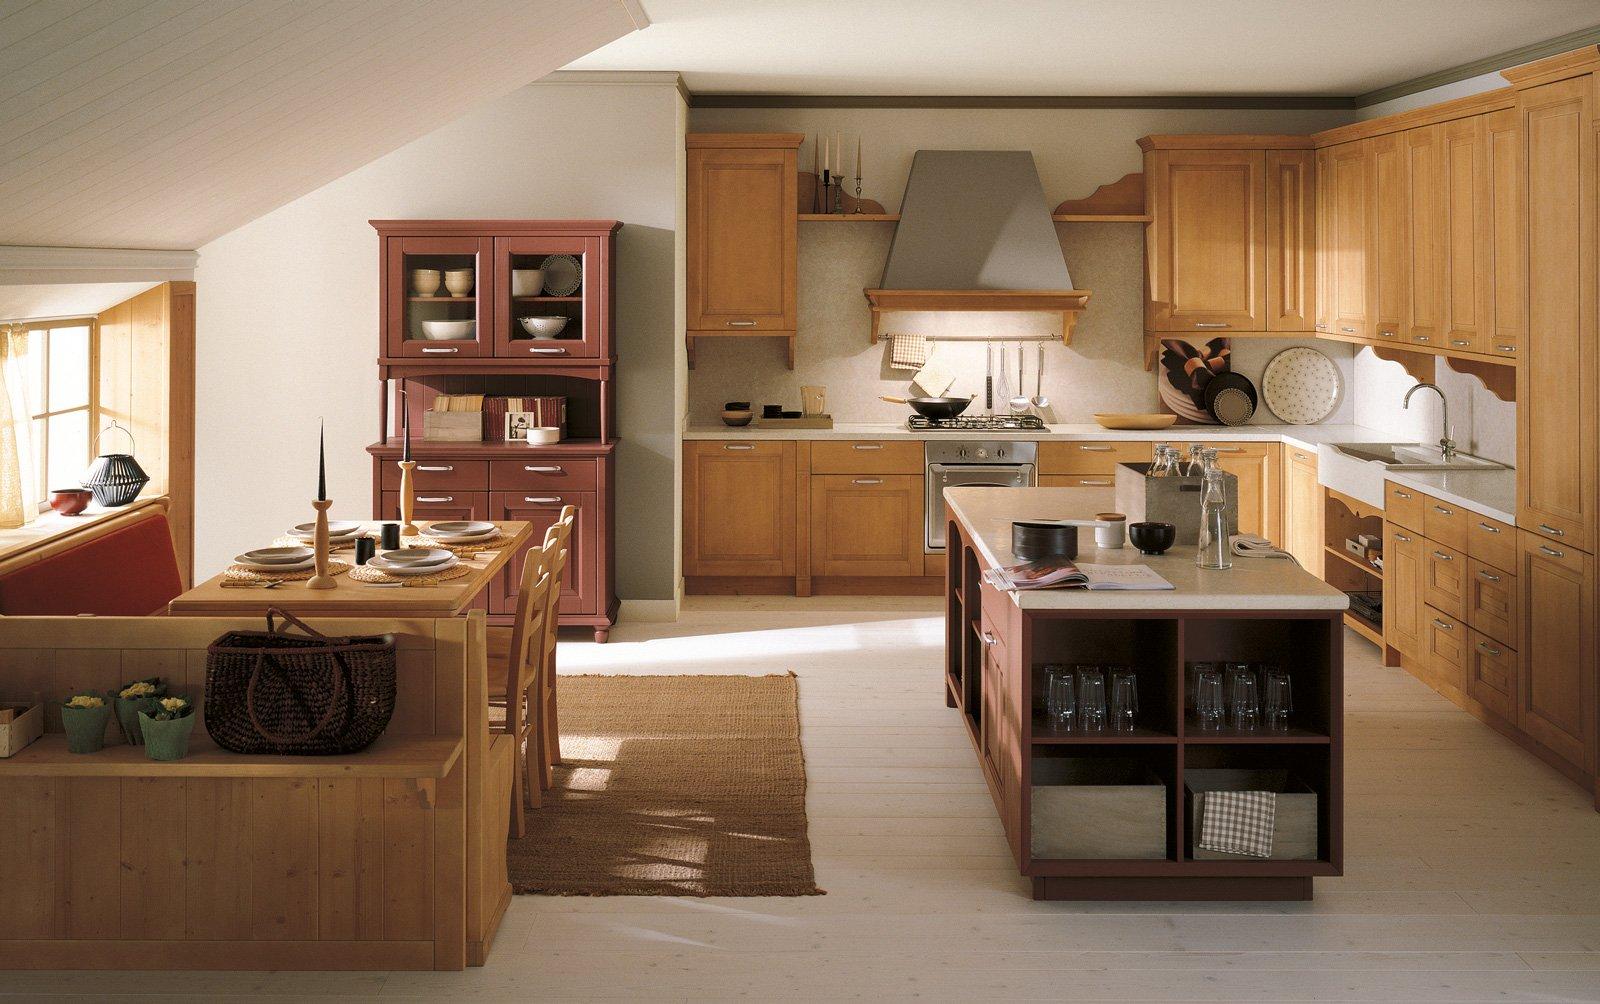 Cucine bicolore l 39 alternanza cromatica fa tendenza cose - Mobili rustici per cucina ...